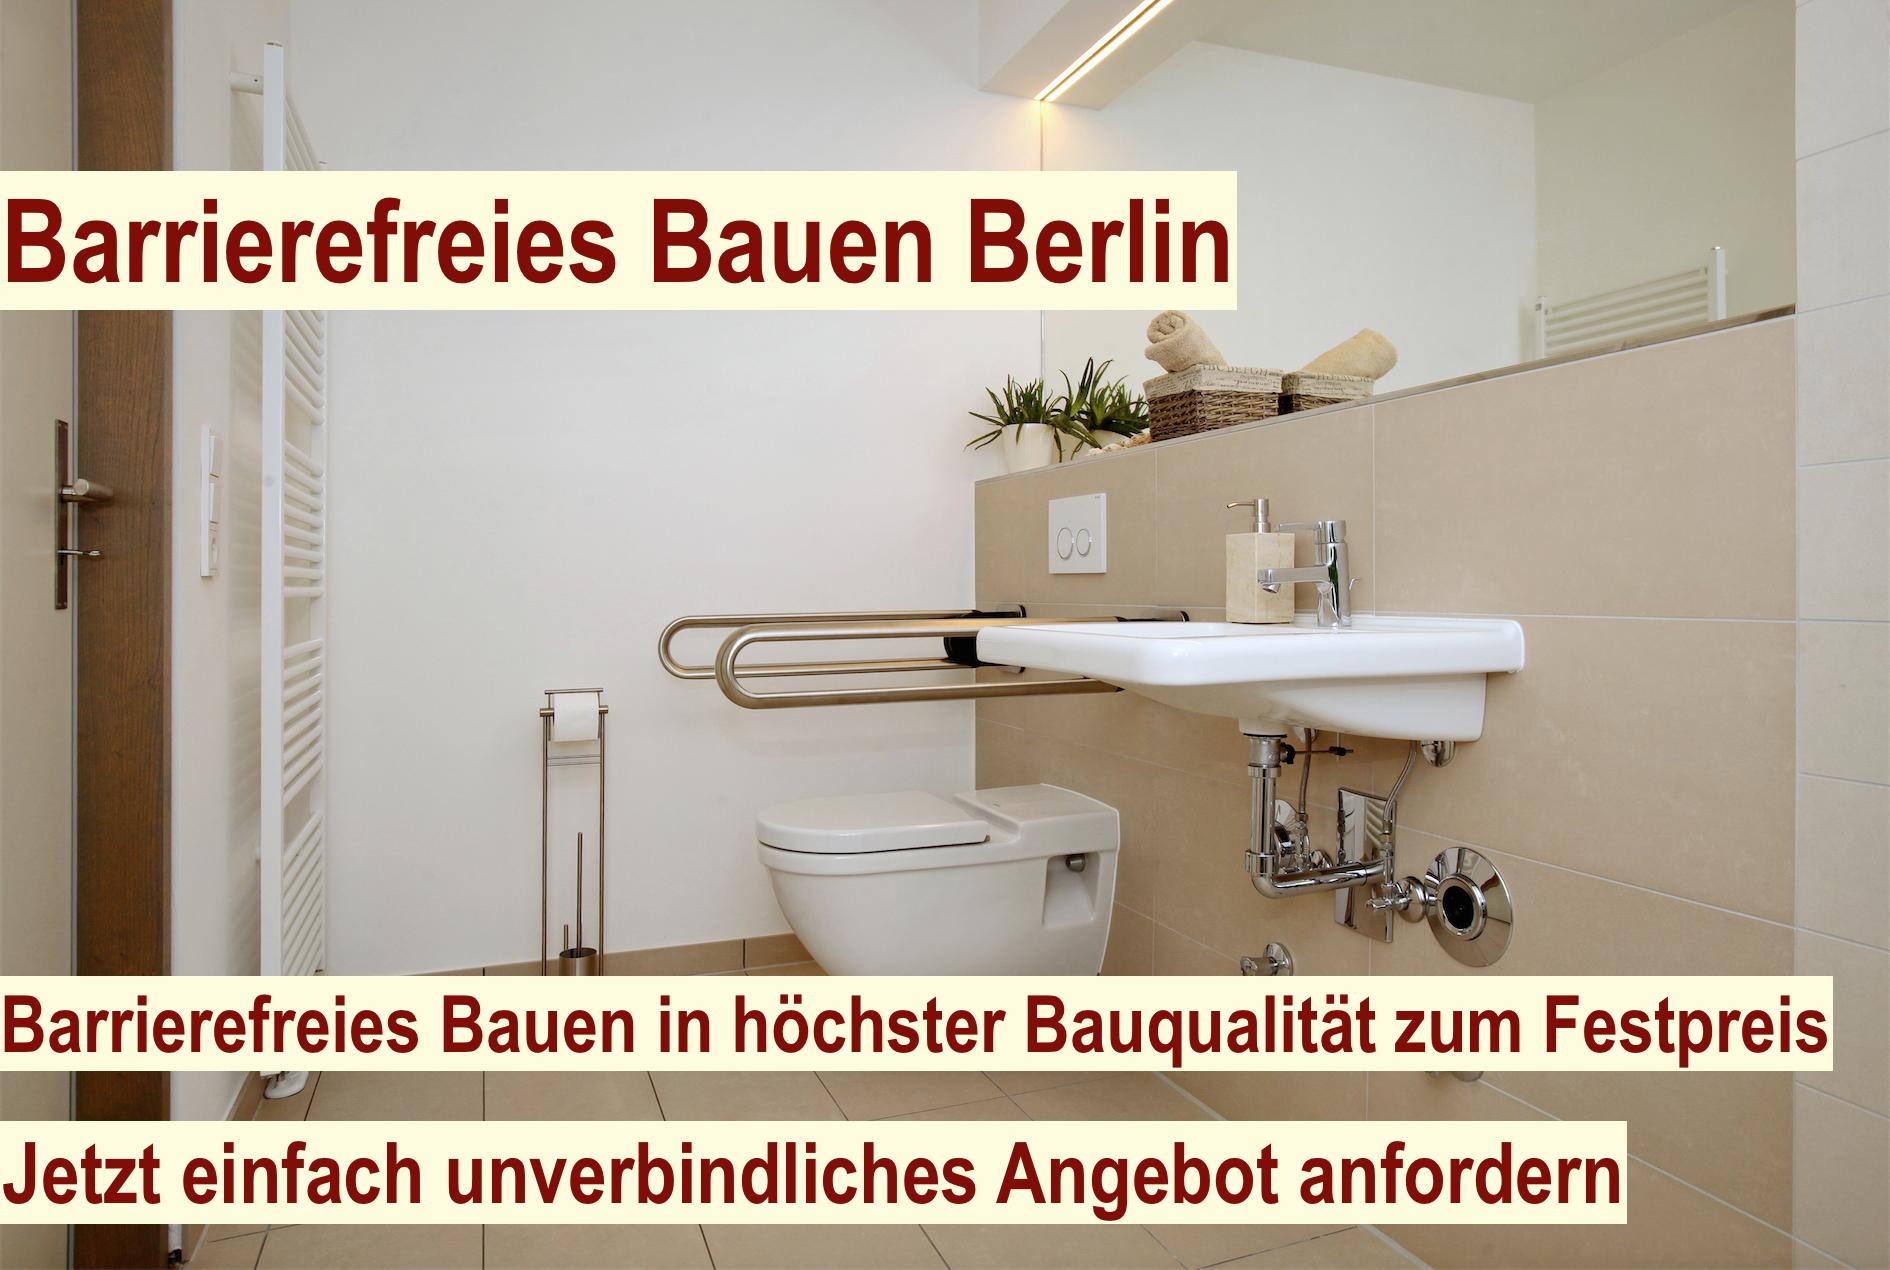 Barrierefreies Bauen Berlin